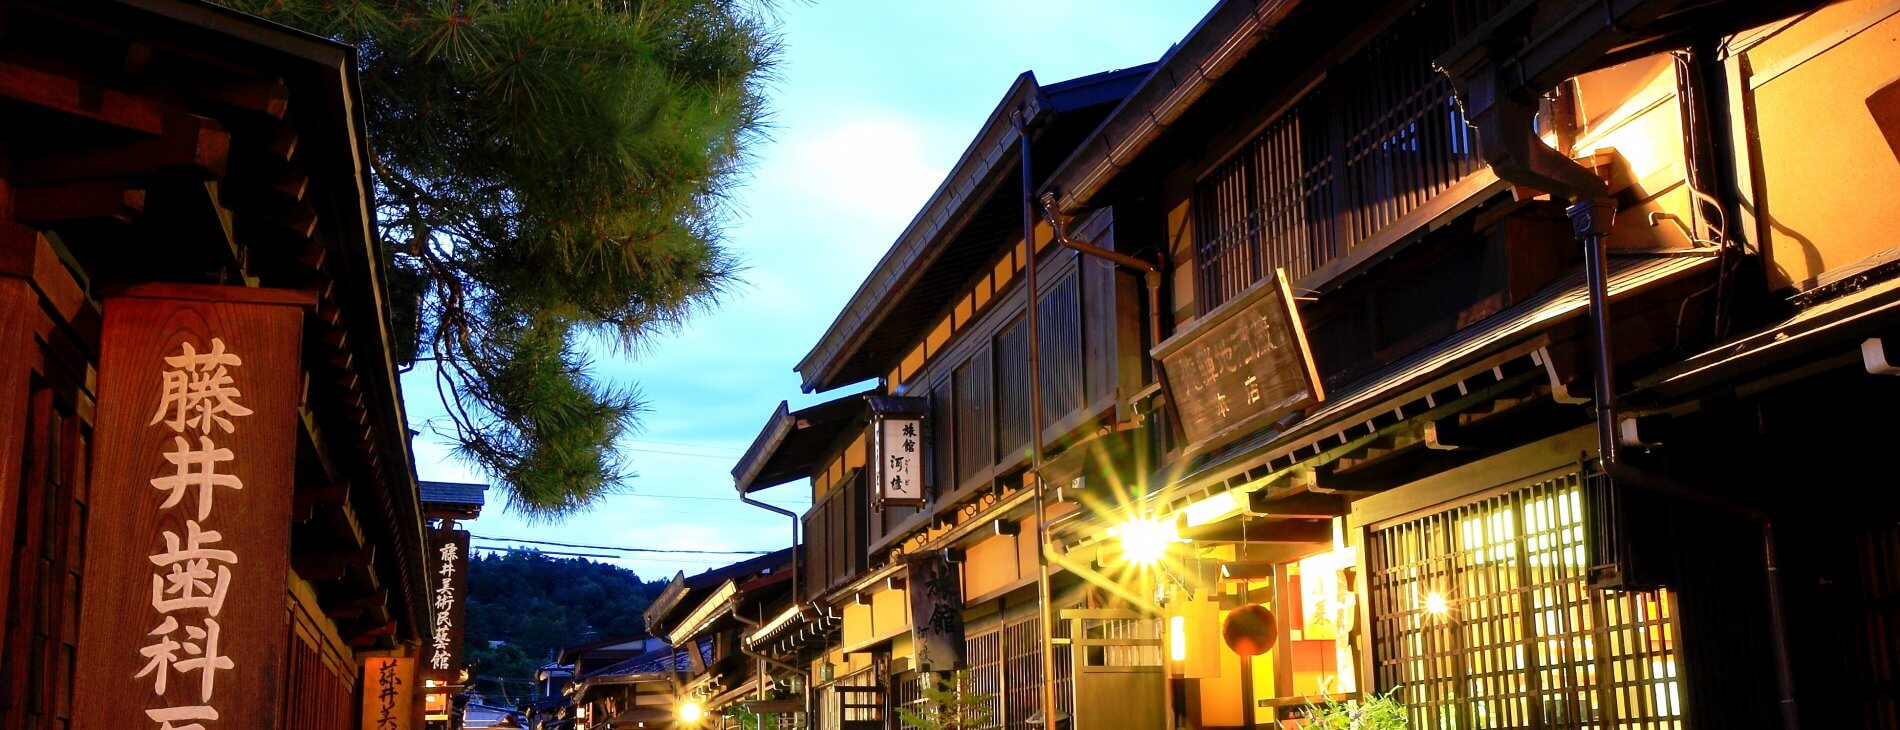 MastroKimono-Takayama-by night